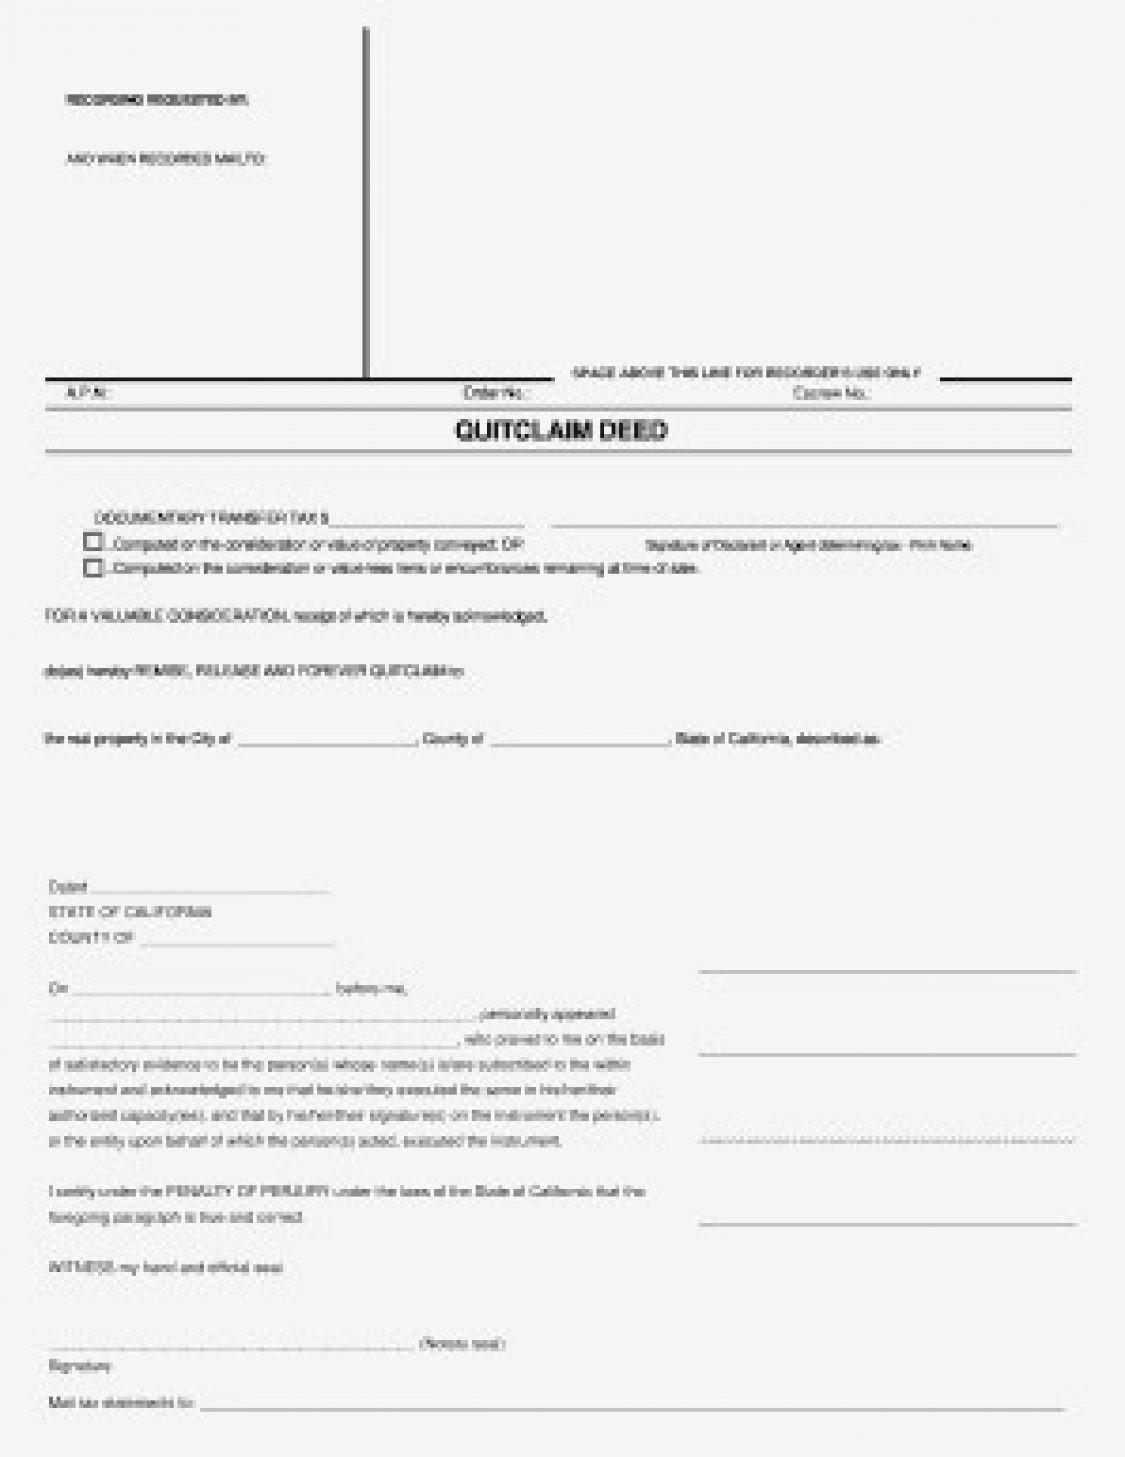 Quit Claim Deed Form Mn Unique Quick Claim Deed Form Quit Endowed Although Mn 728 942 ? Egovasia